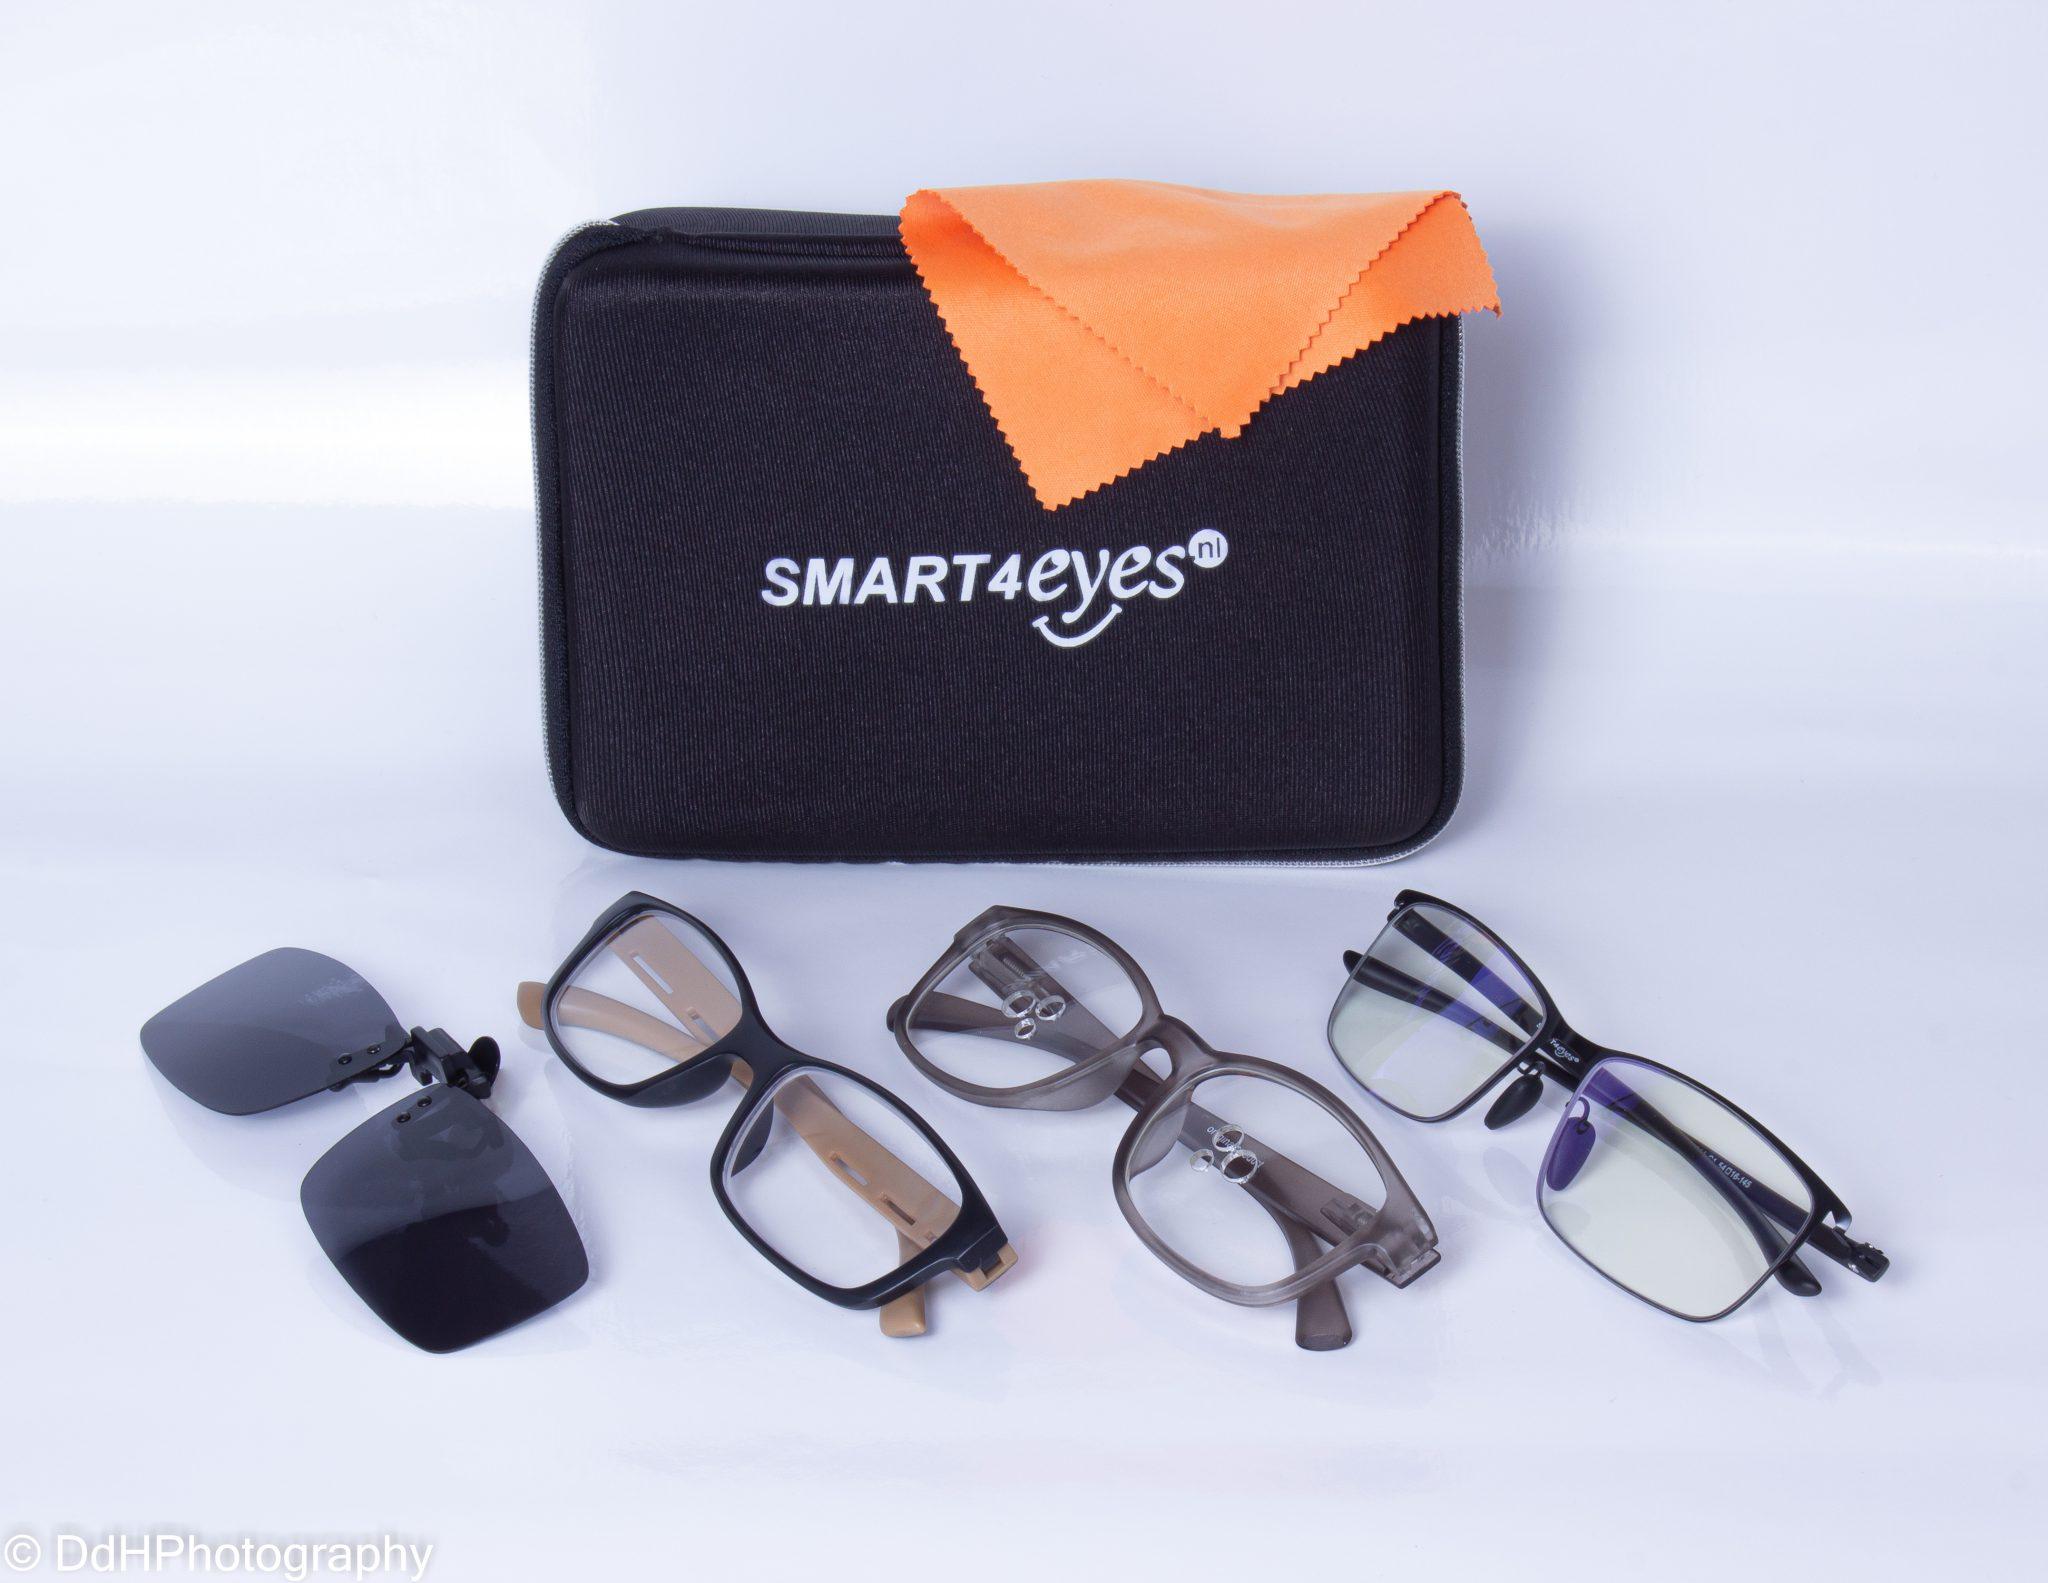 SMART4eyes box